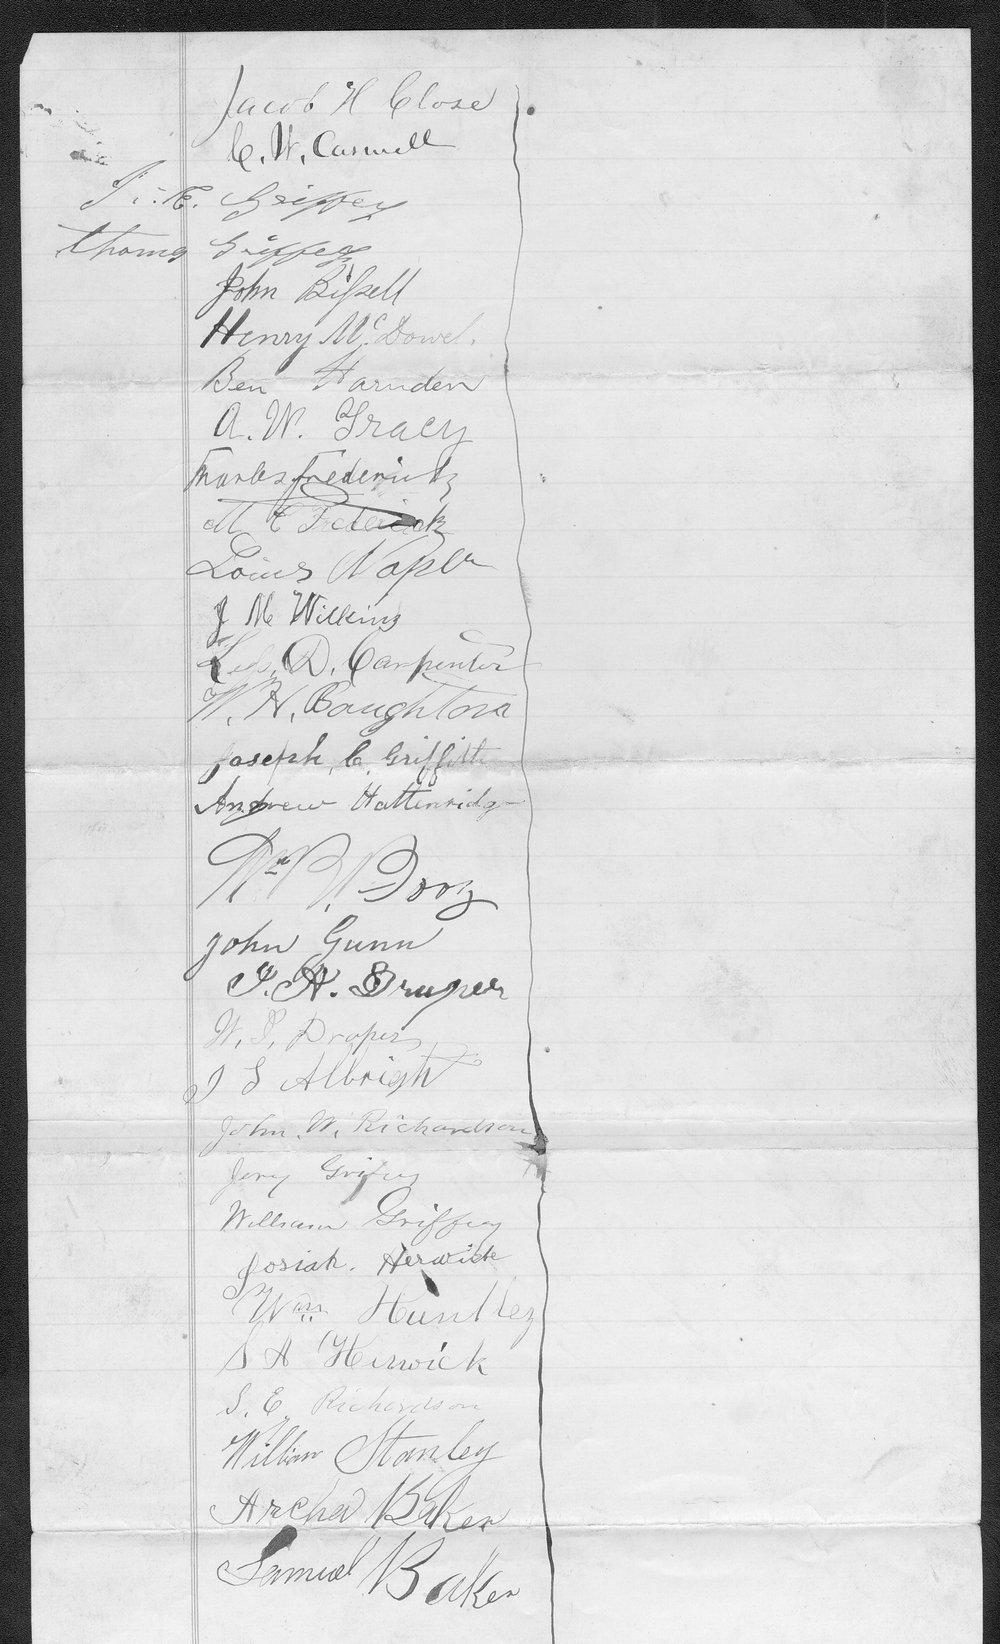 Phillips County organization records - 11